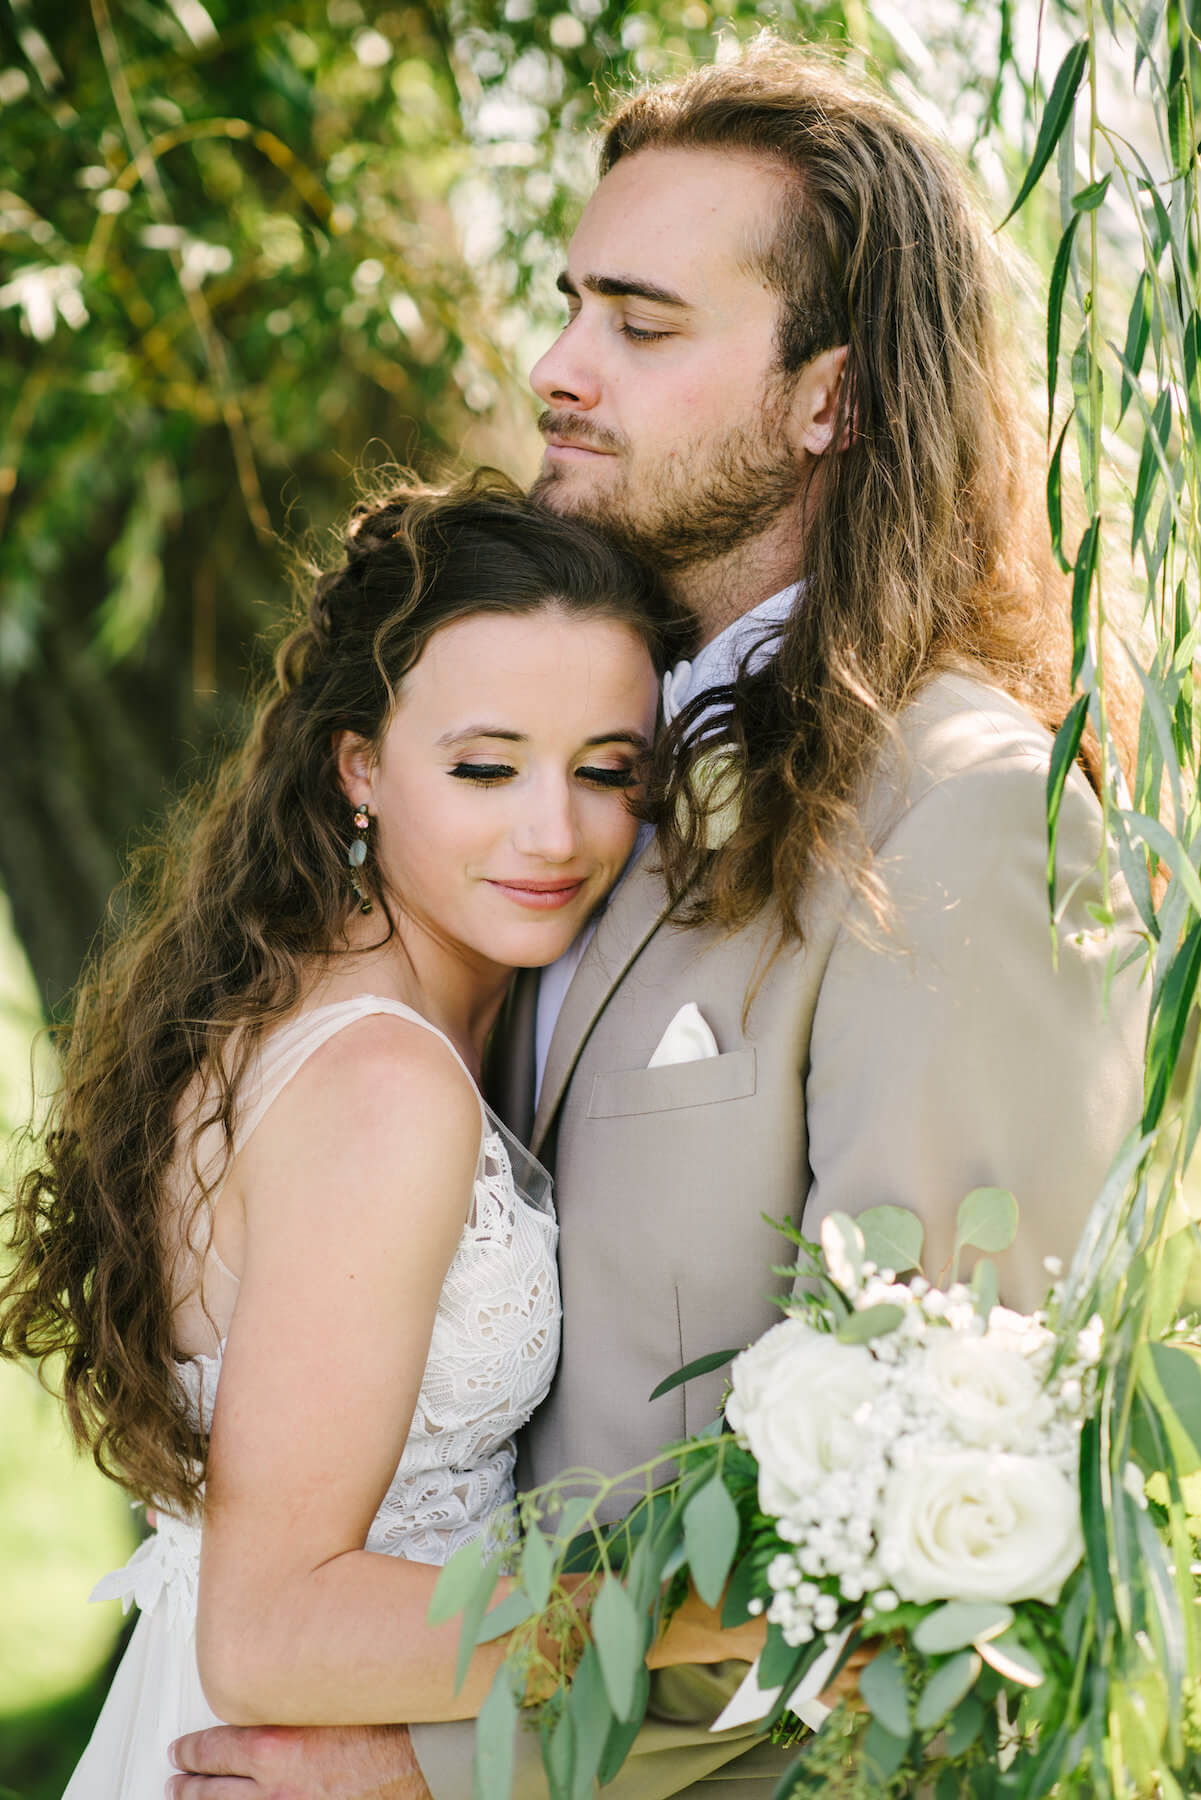 engle-olson-wedding-blair-taylor-24.jpg